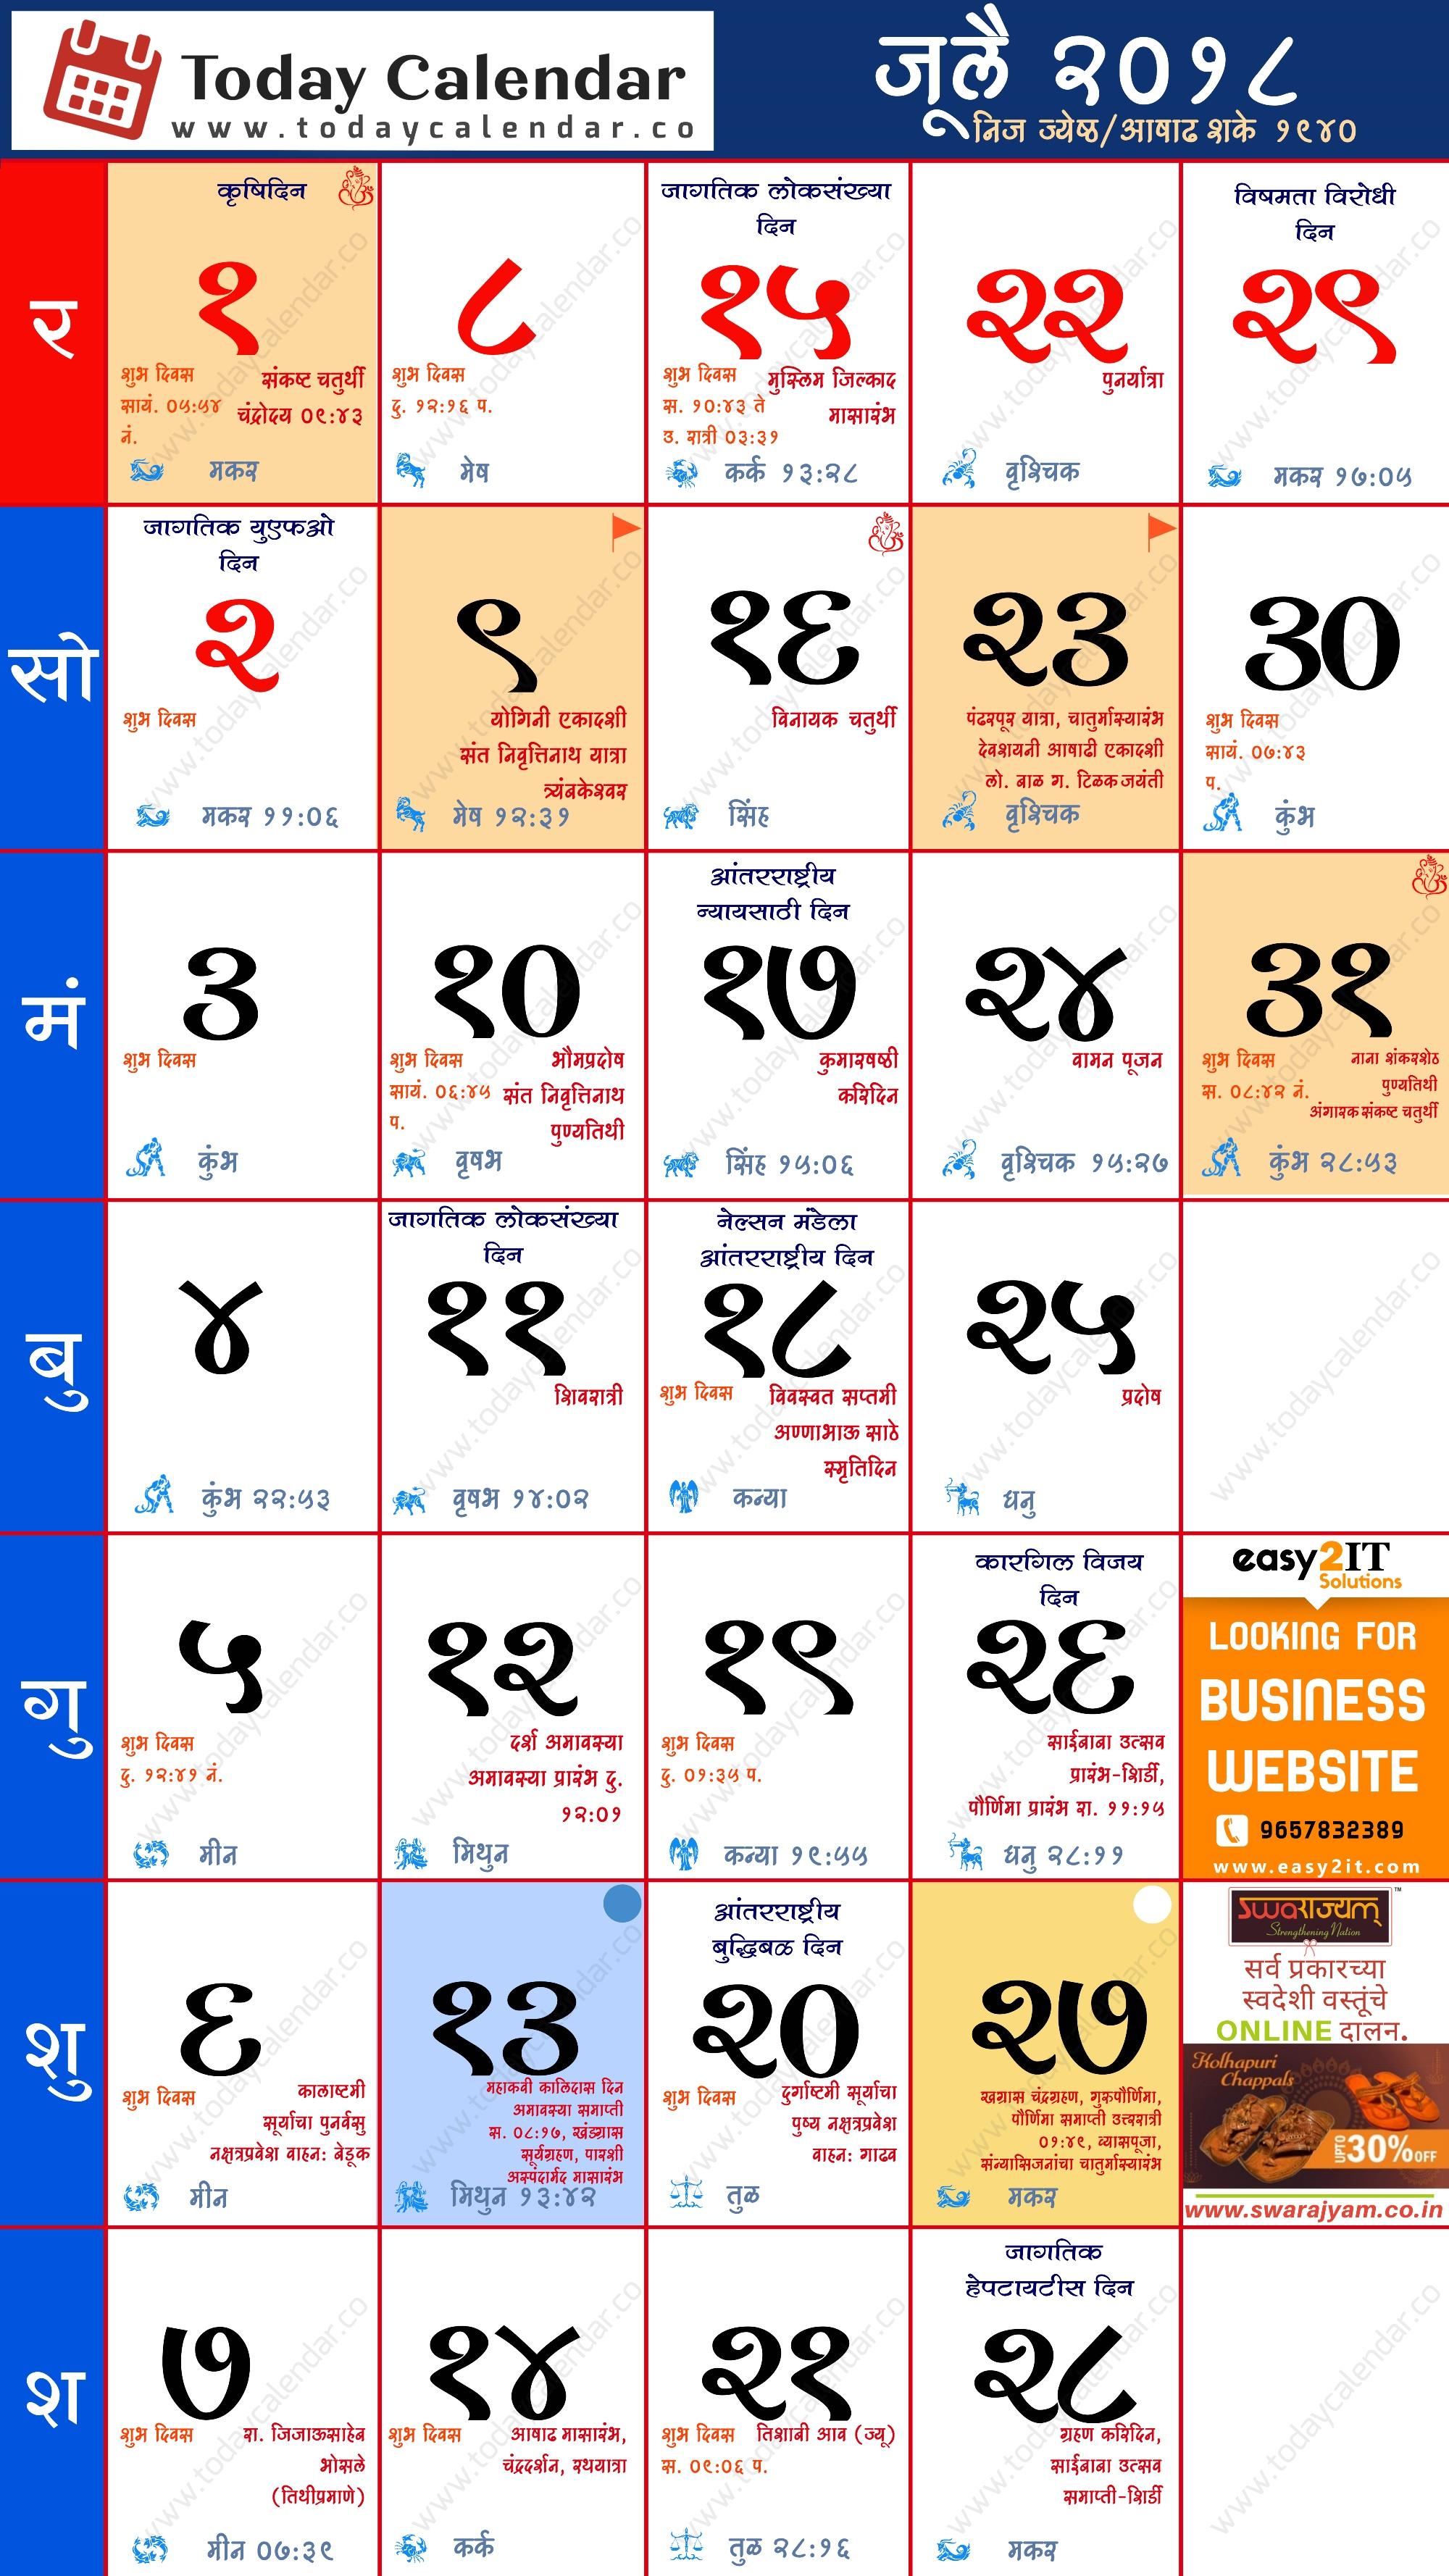 July marathi calendar 2018 todaycalendar